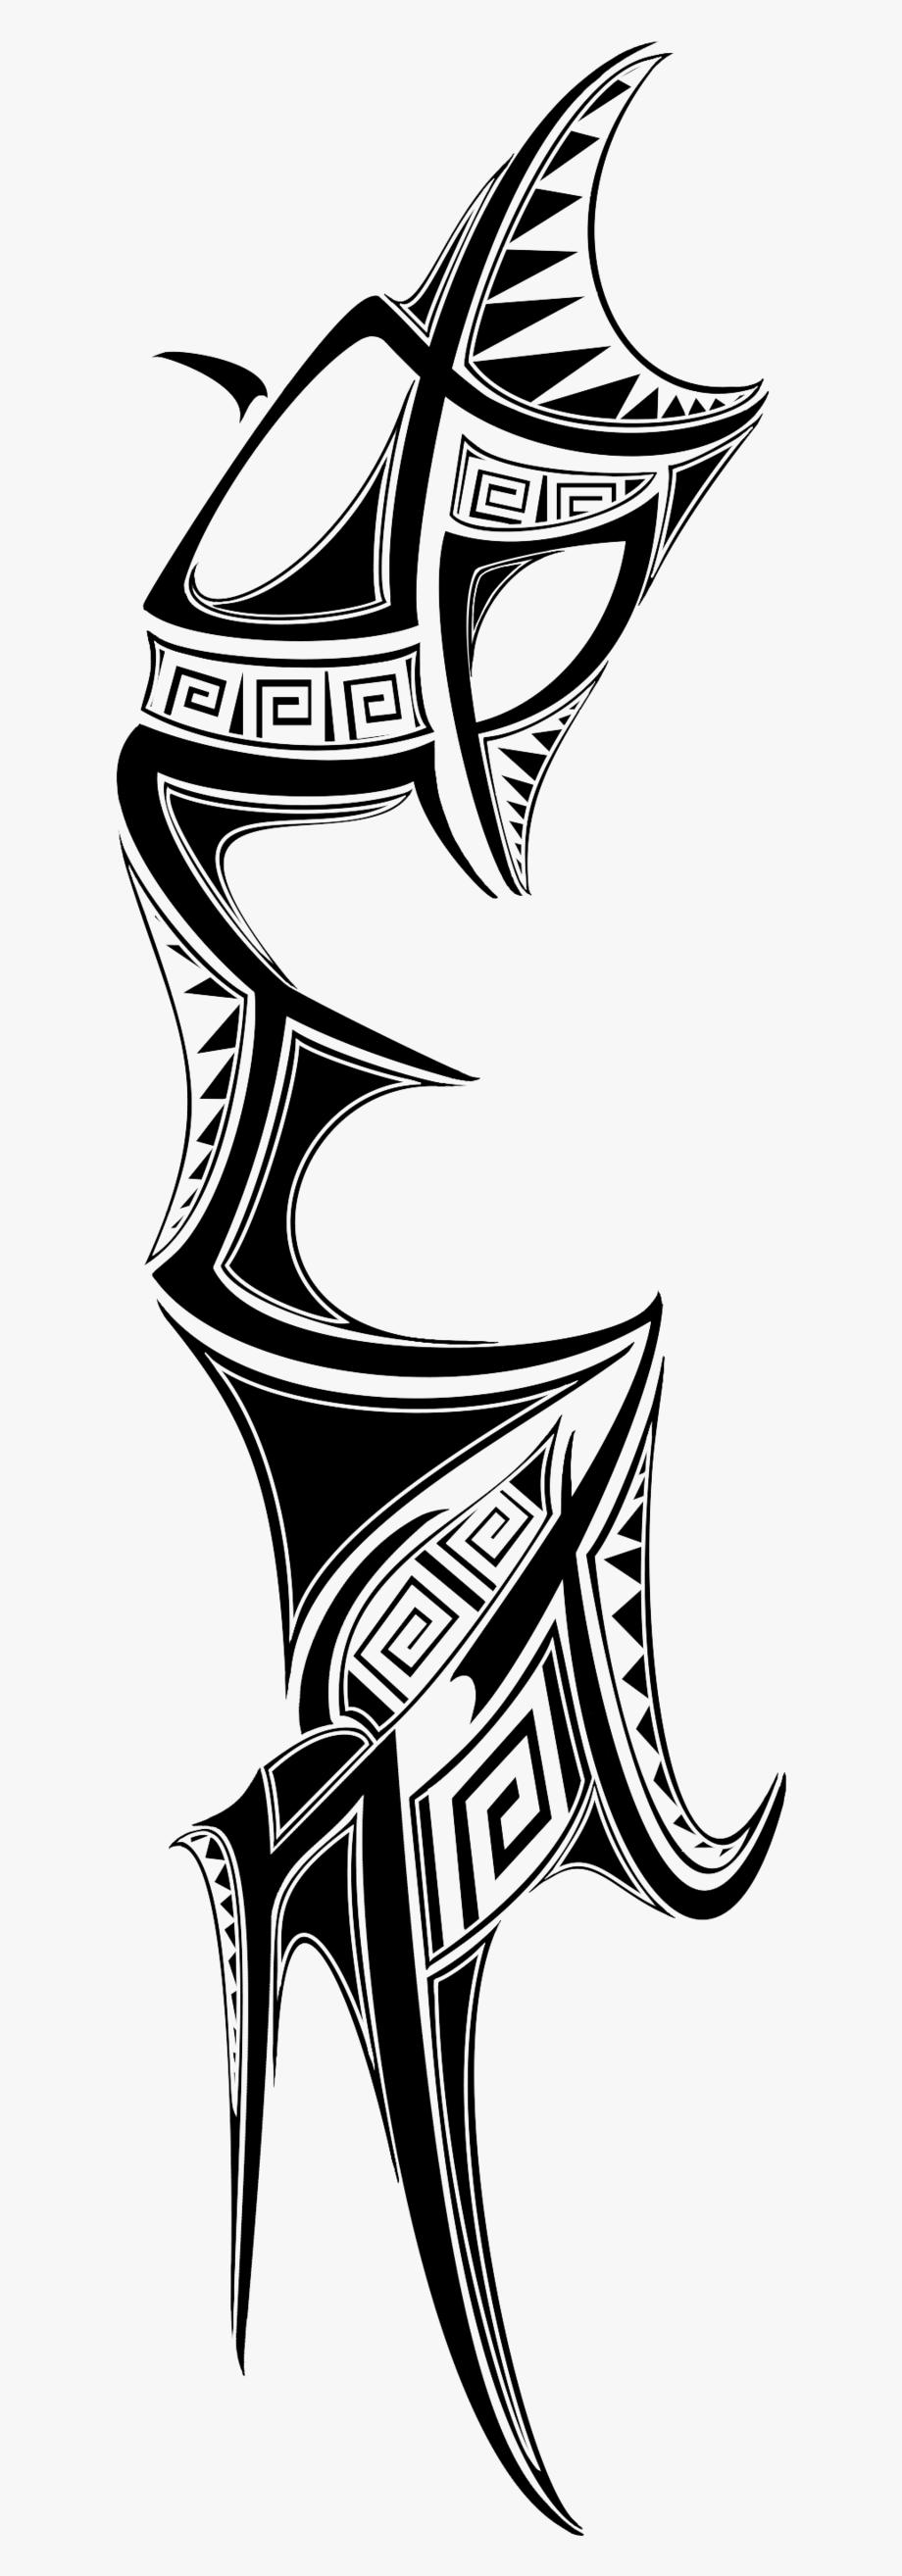 Tattoo picsart clipart vector free stock Arm Tattoo Png Clipart - Hand Tattoo Png For Picsart #146117 ... vector free stock